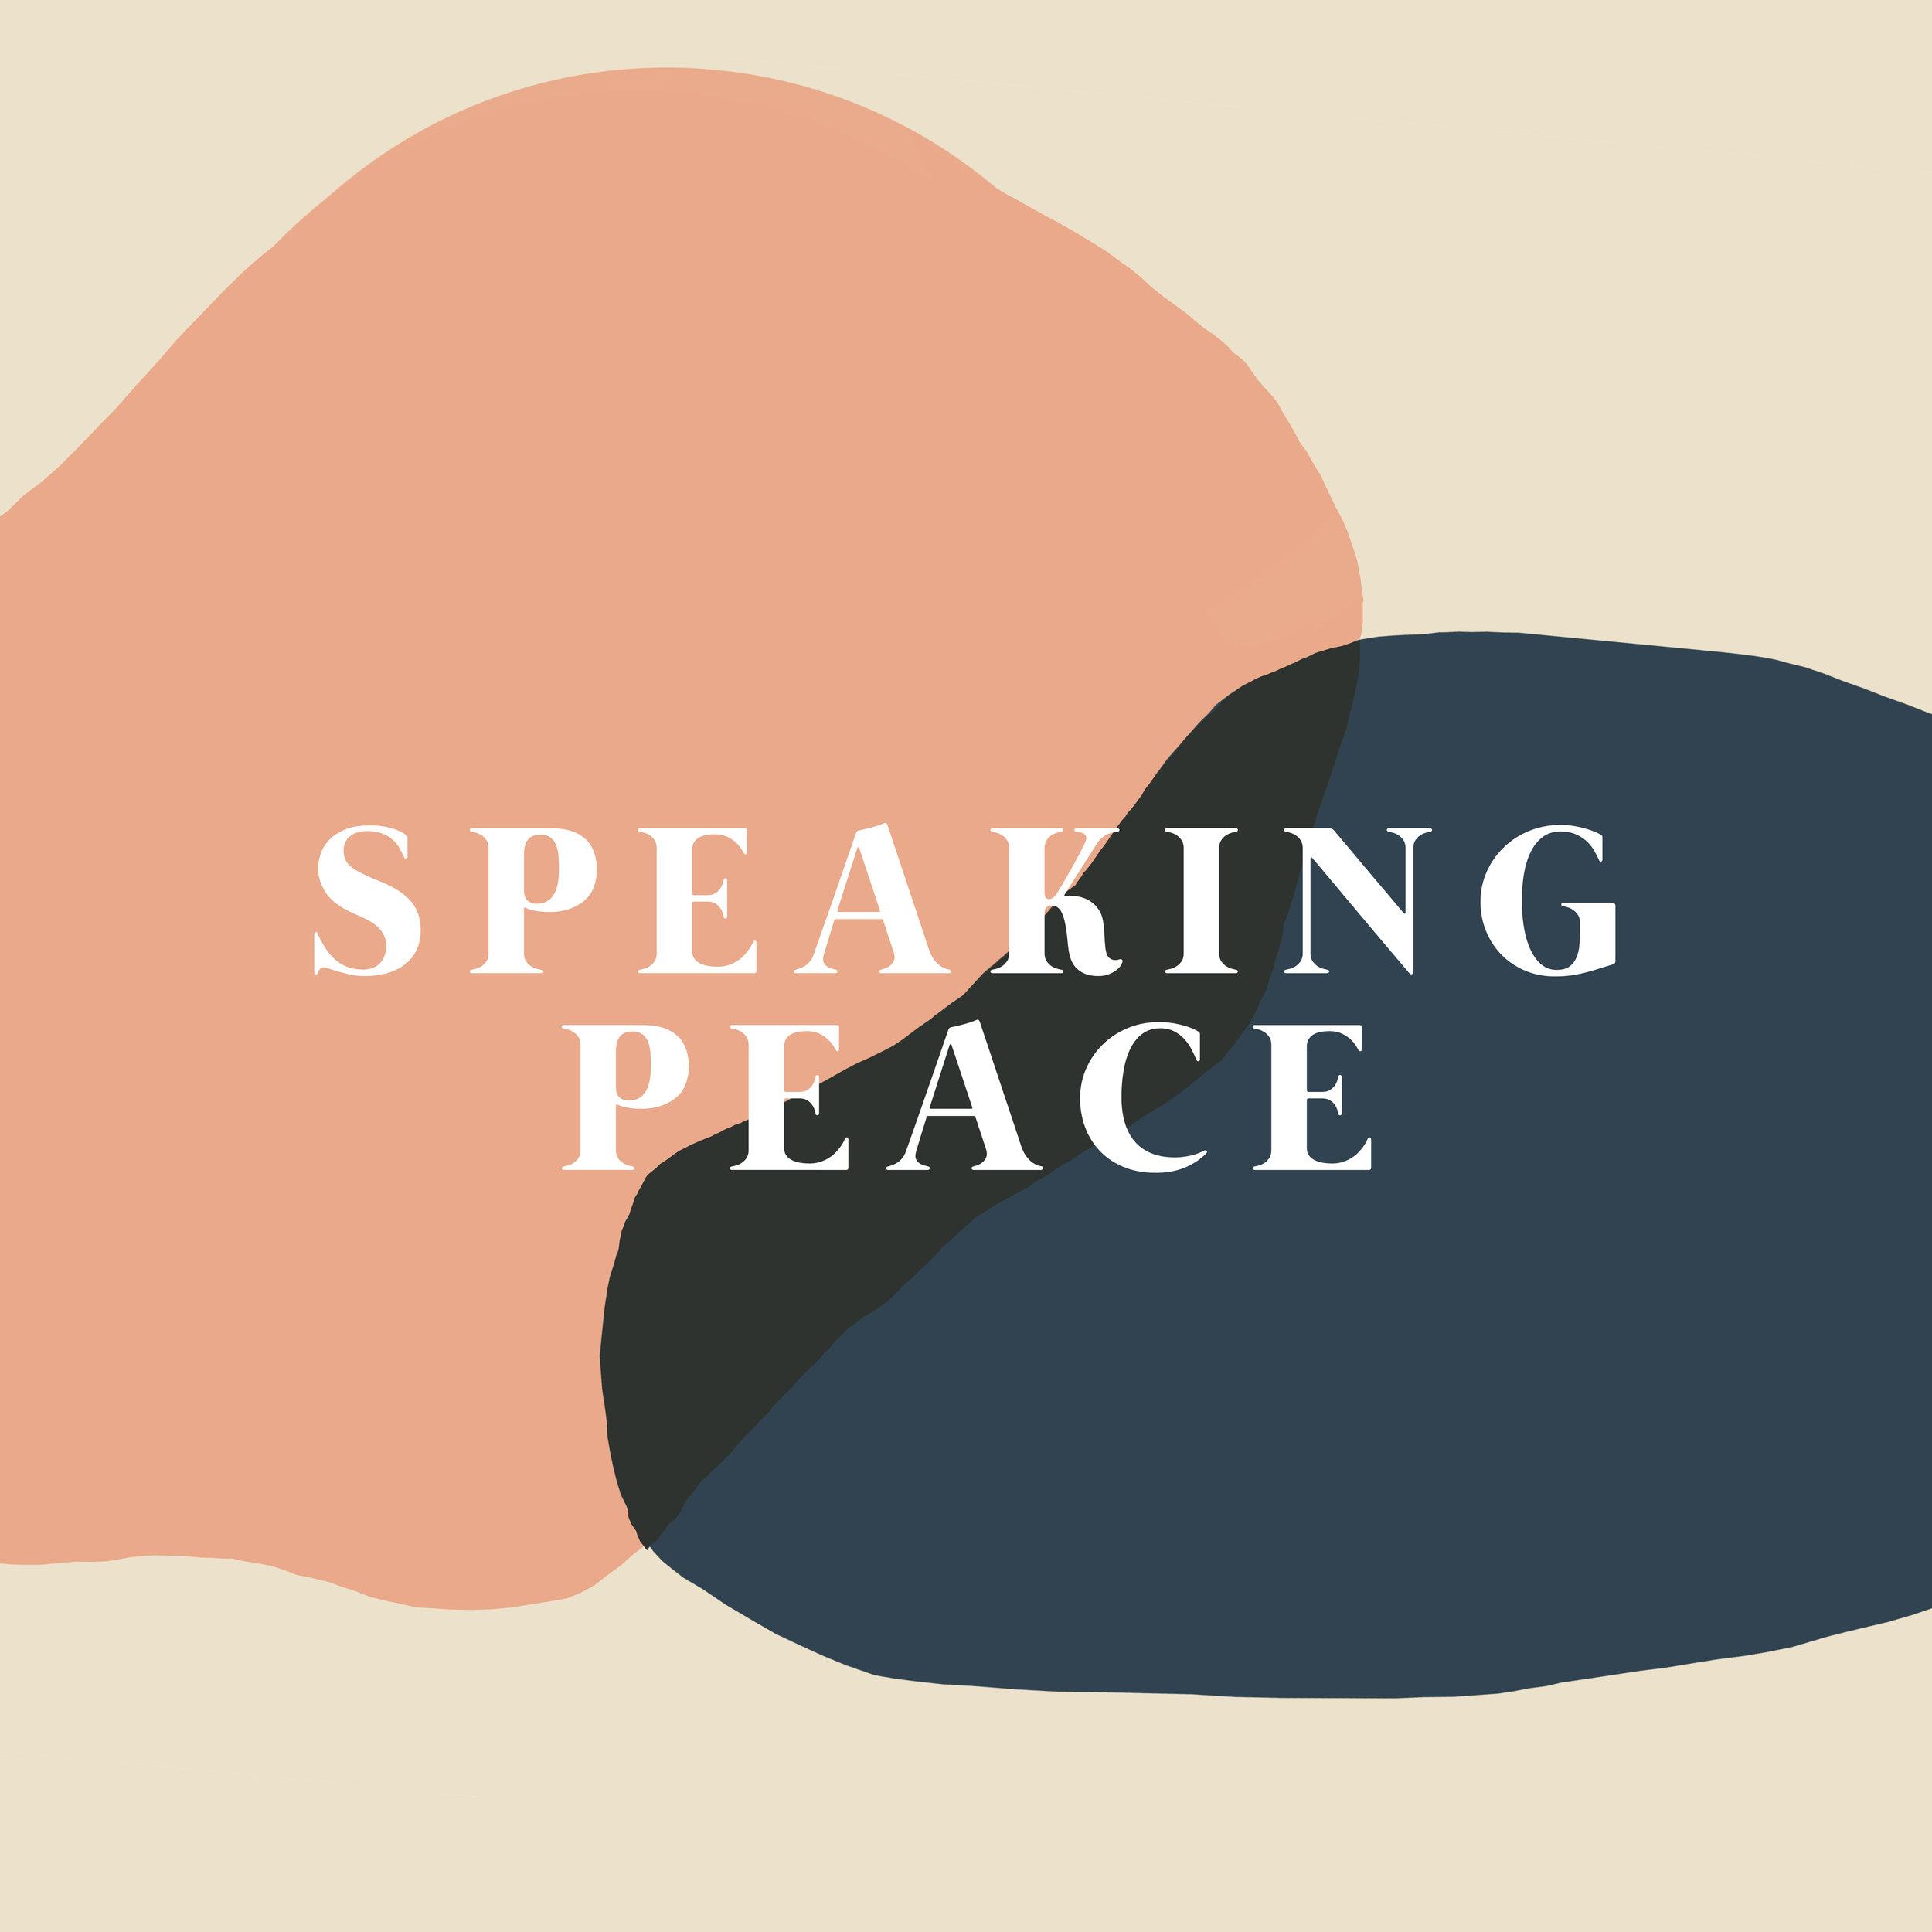 SpeakingPeaceSQ.jpg